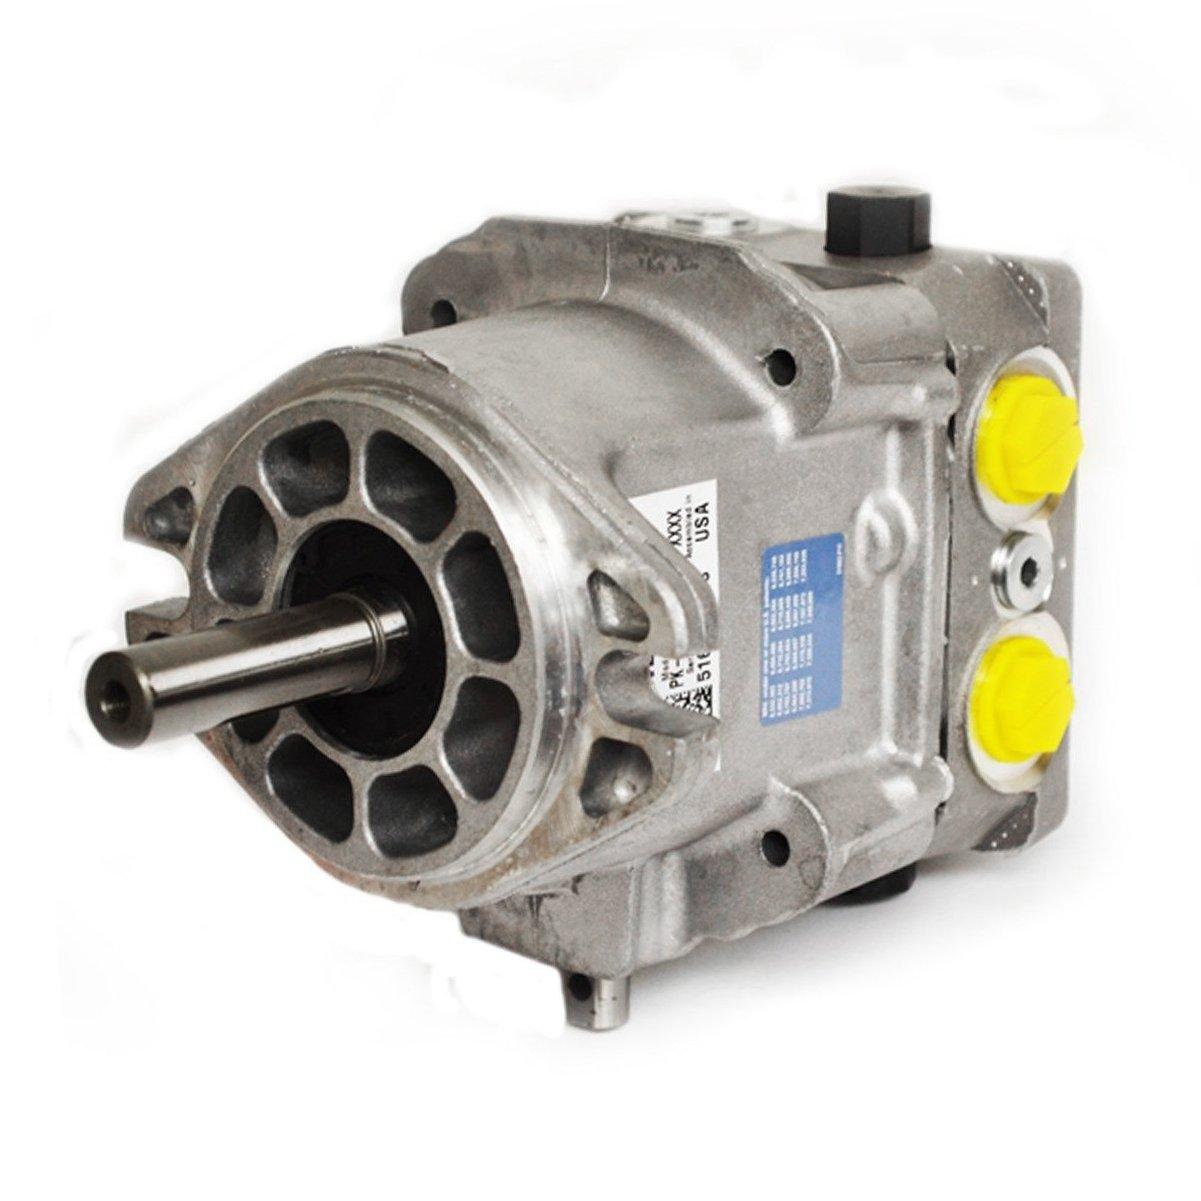 Hydro-Gear PK-BGAB-EY1X-XXXX Bomba de Repuesto para cortacésped ...